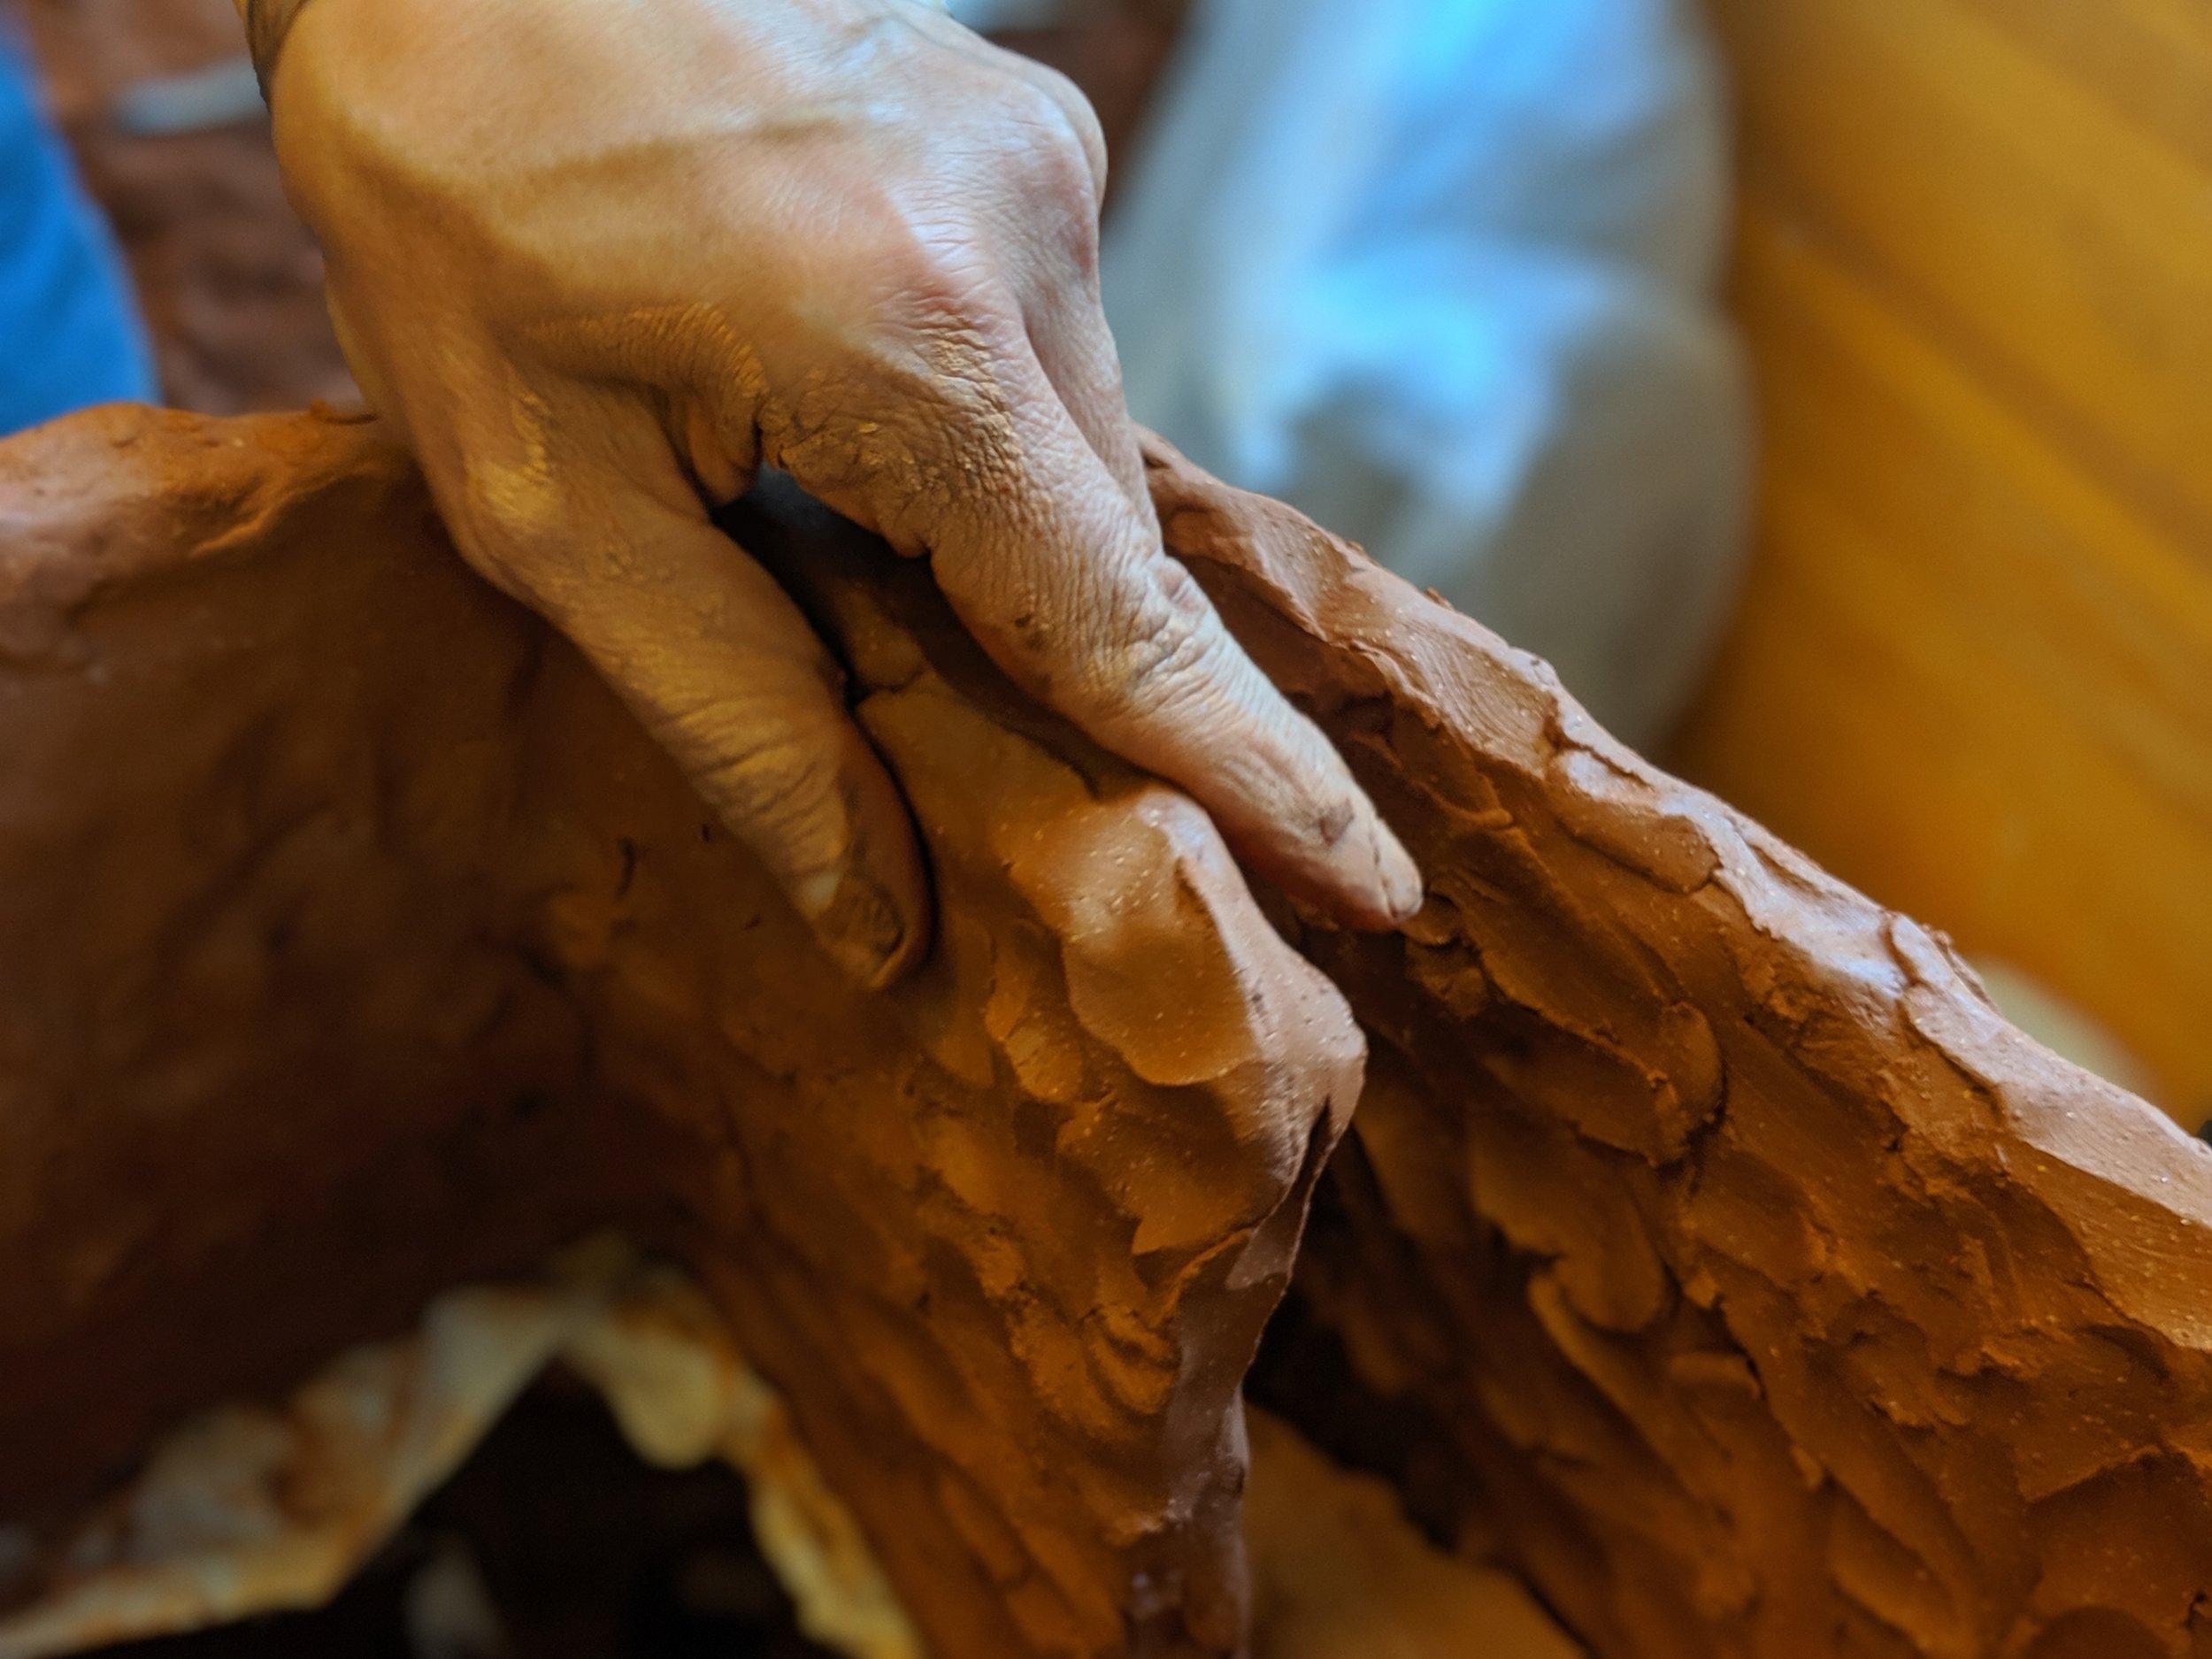 Sahar Khoury at work, Art Practice Ceramics Lab, 2019